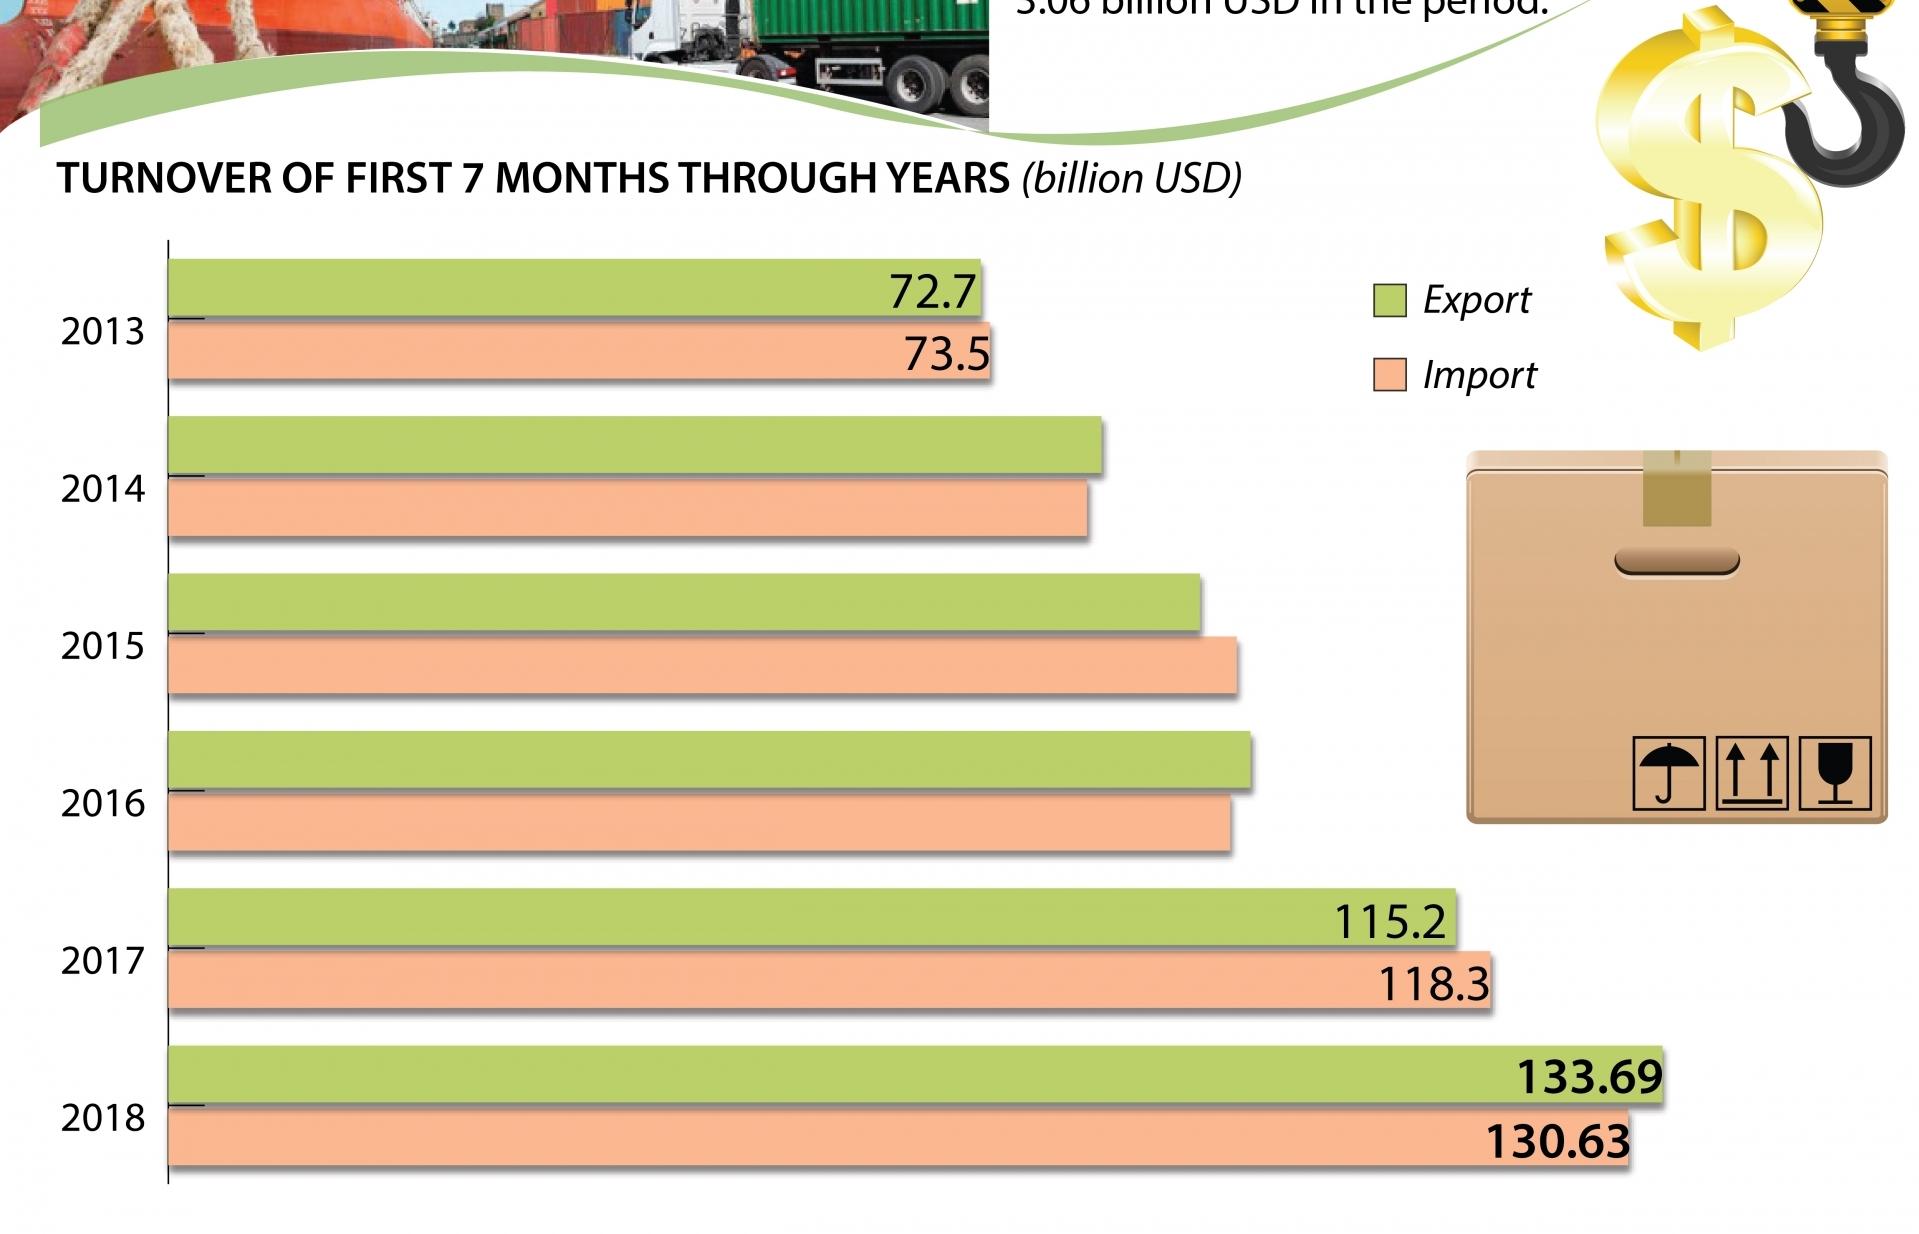 First seven months see trade surplus at 3.06 billion USD